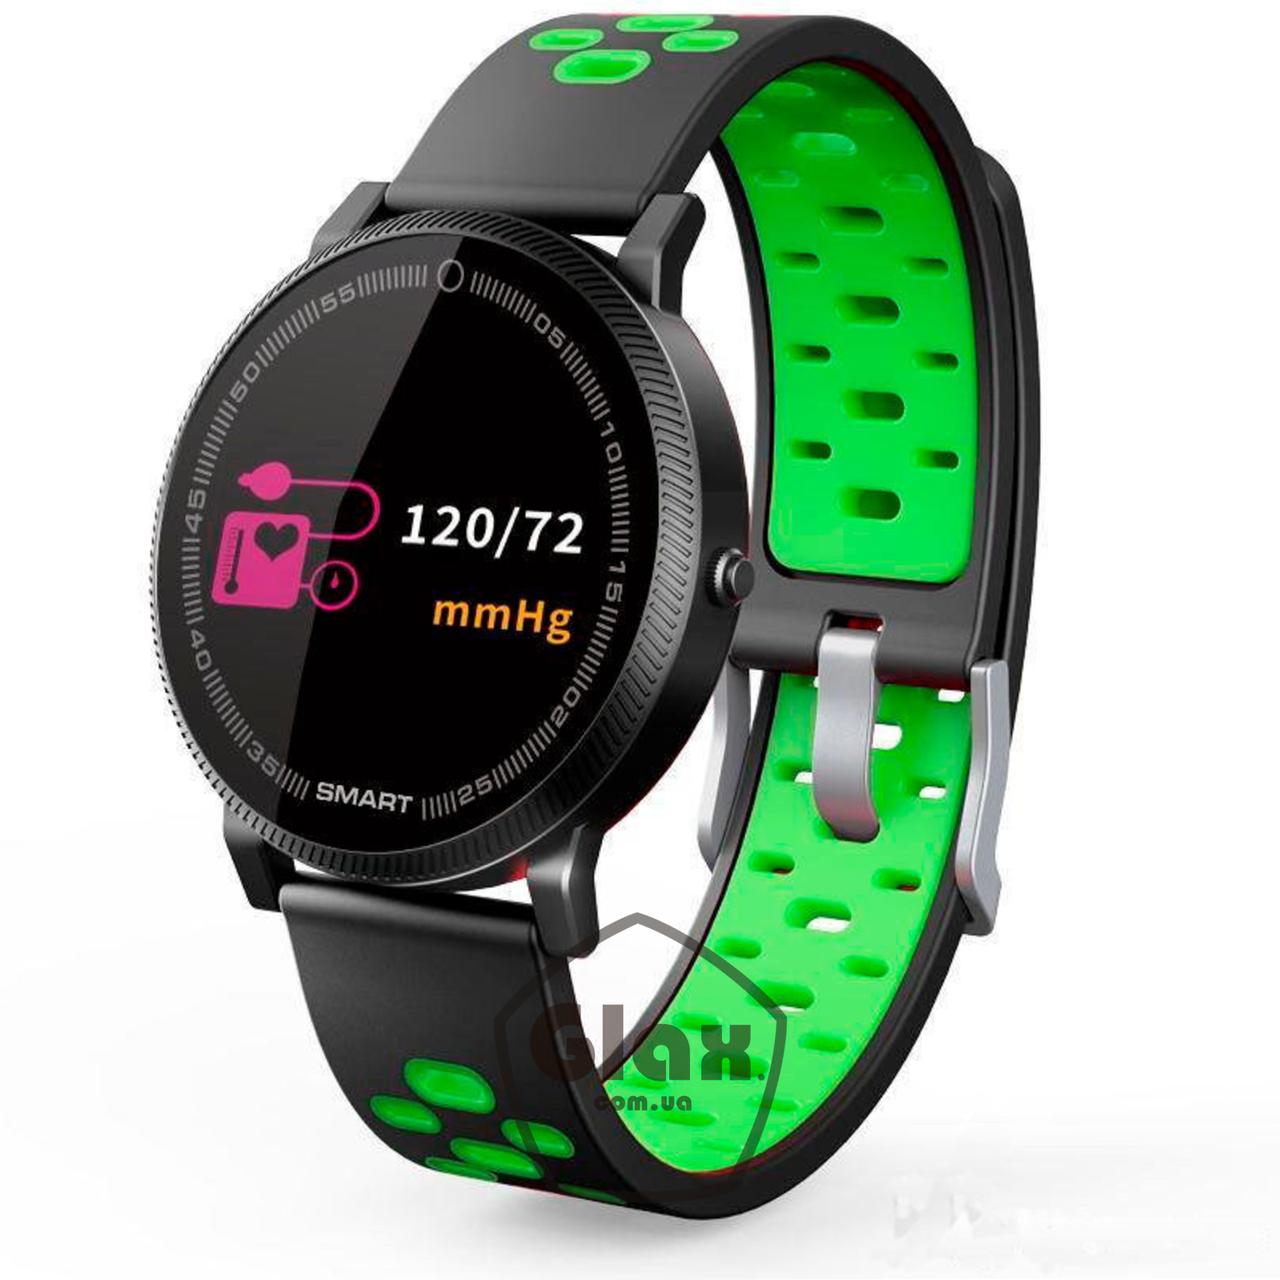 Смарт часы Smart Watch F4, умные часы, фитнес-трекер, смарт часы, часофон